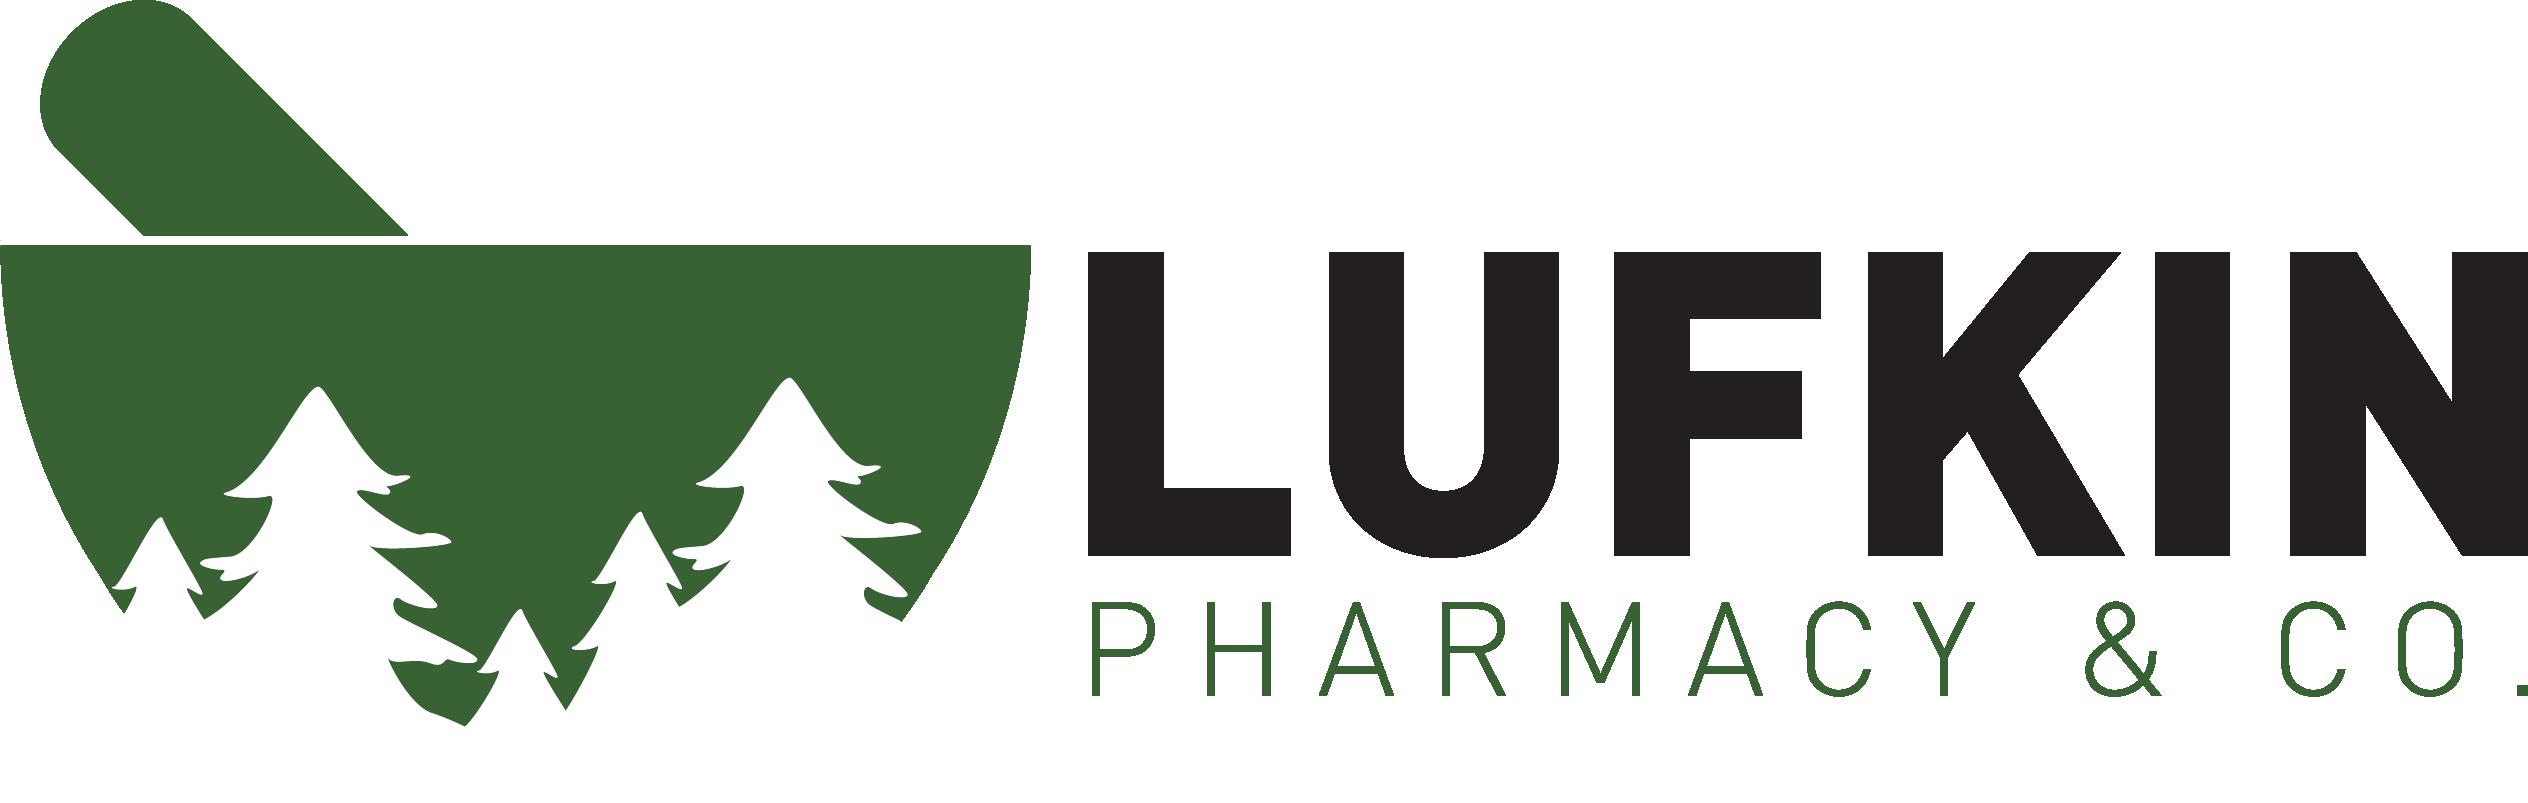 New - Lufkin Pharmacy & Co.